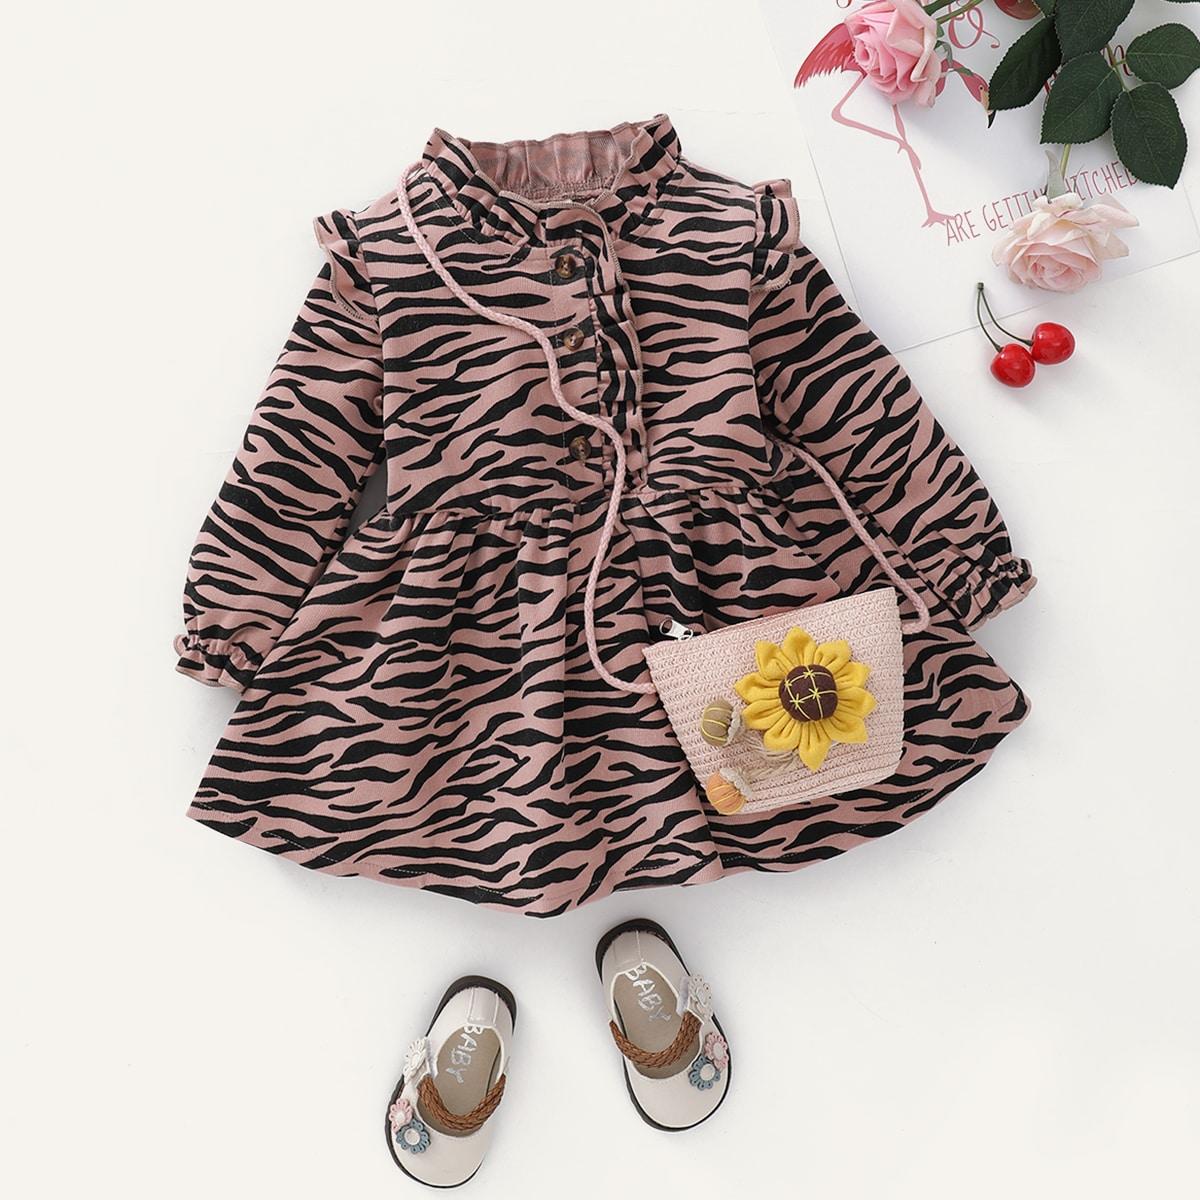 shein Schattig Zebra print Baby-jurk Rimpeling